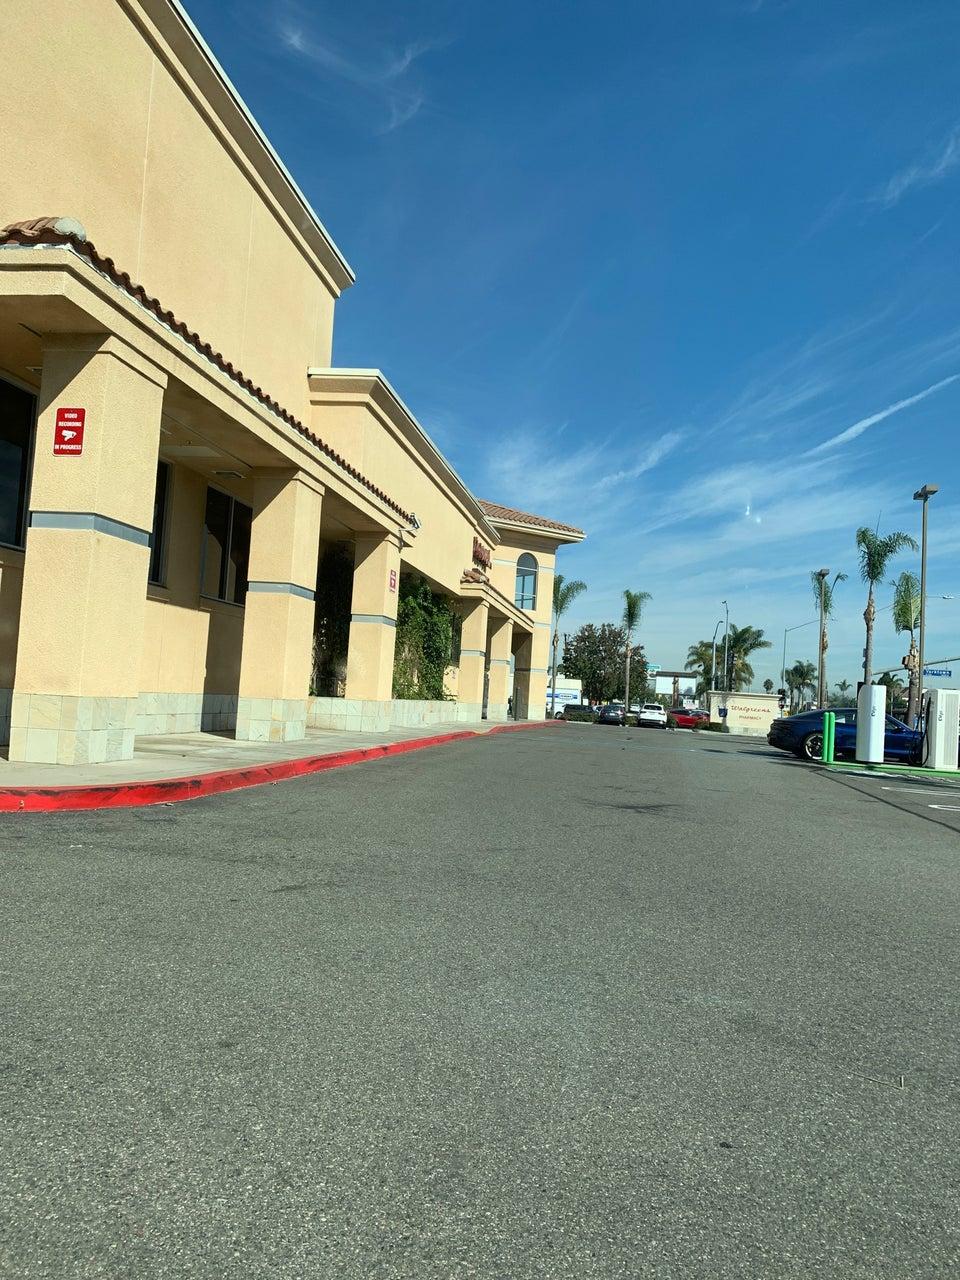 Walgreens Pharmacy 19501 Beach Blvd, Huntington Beach